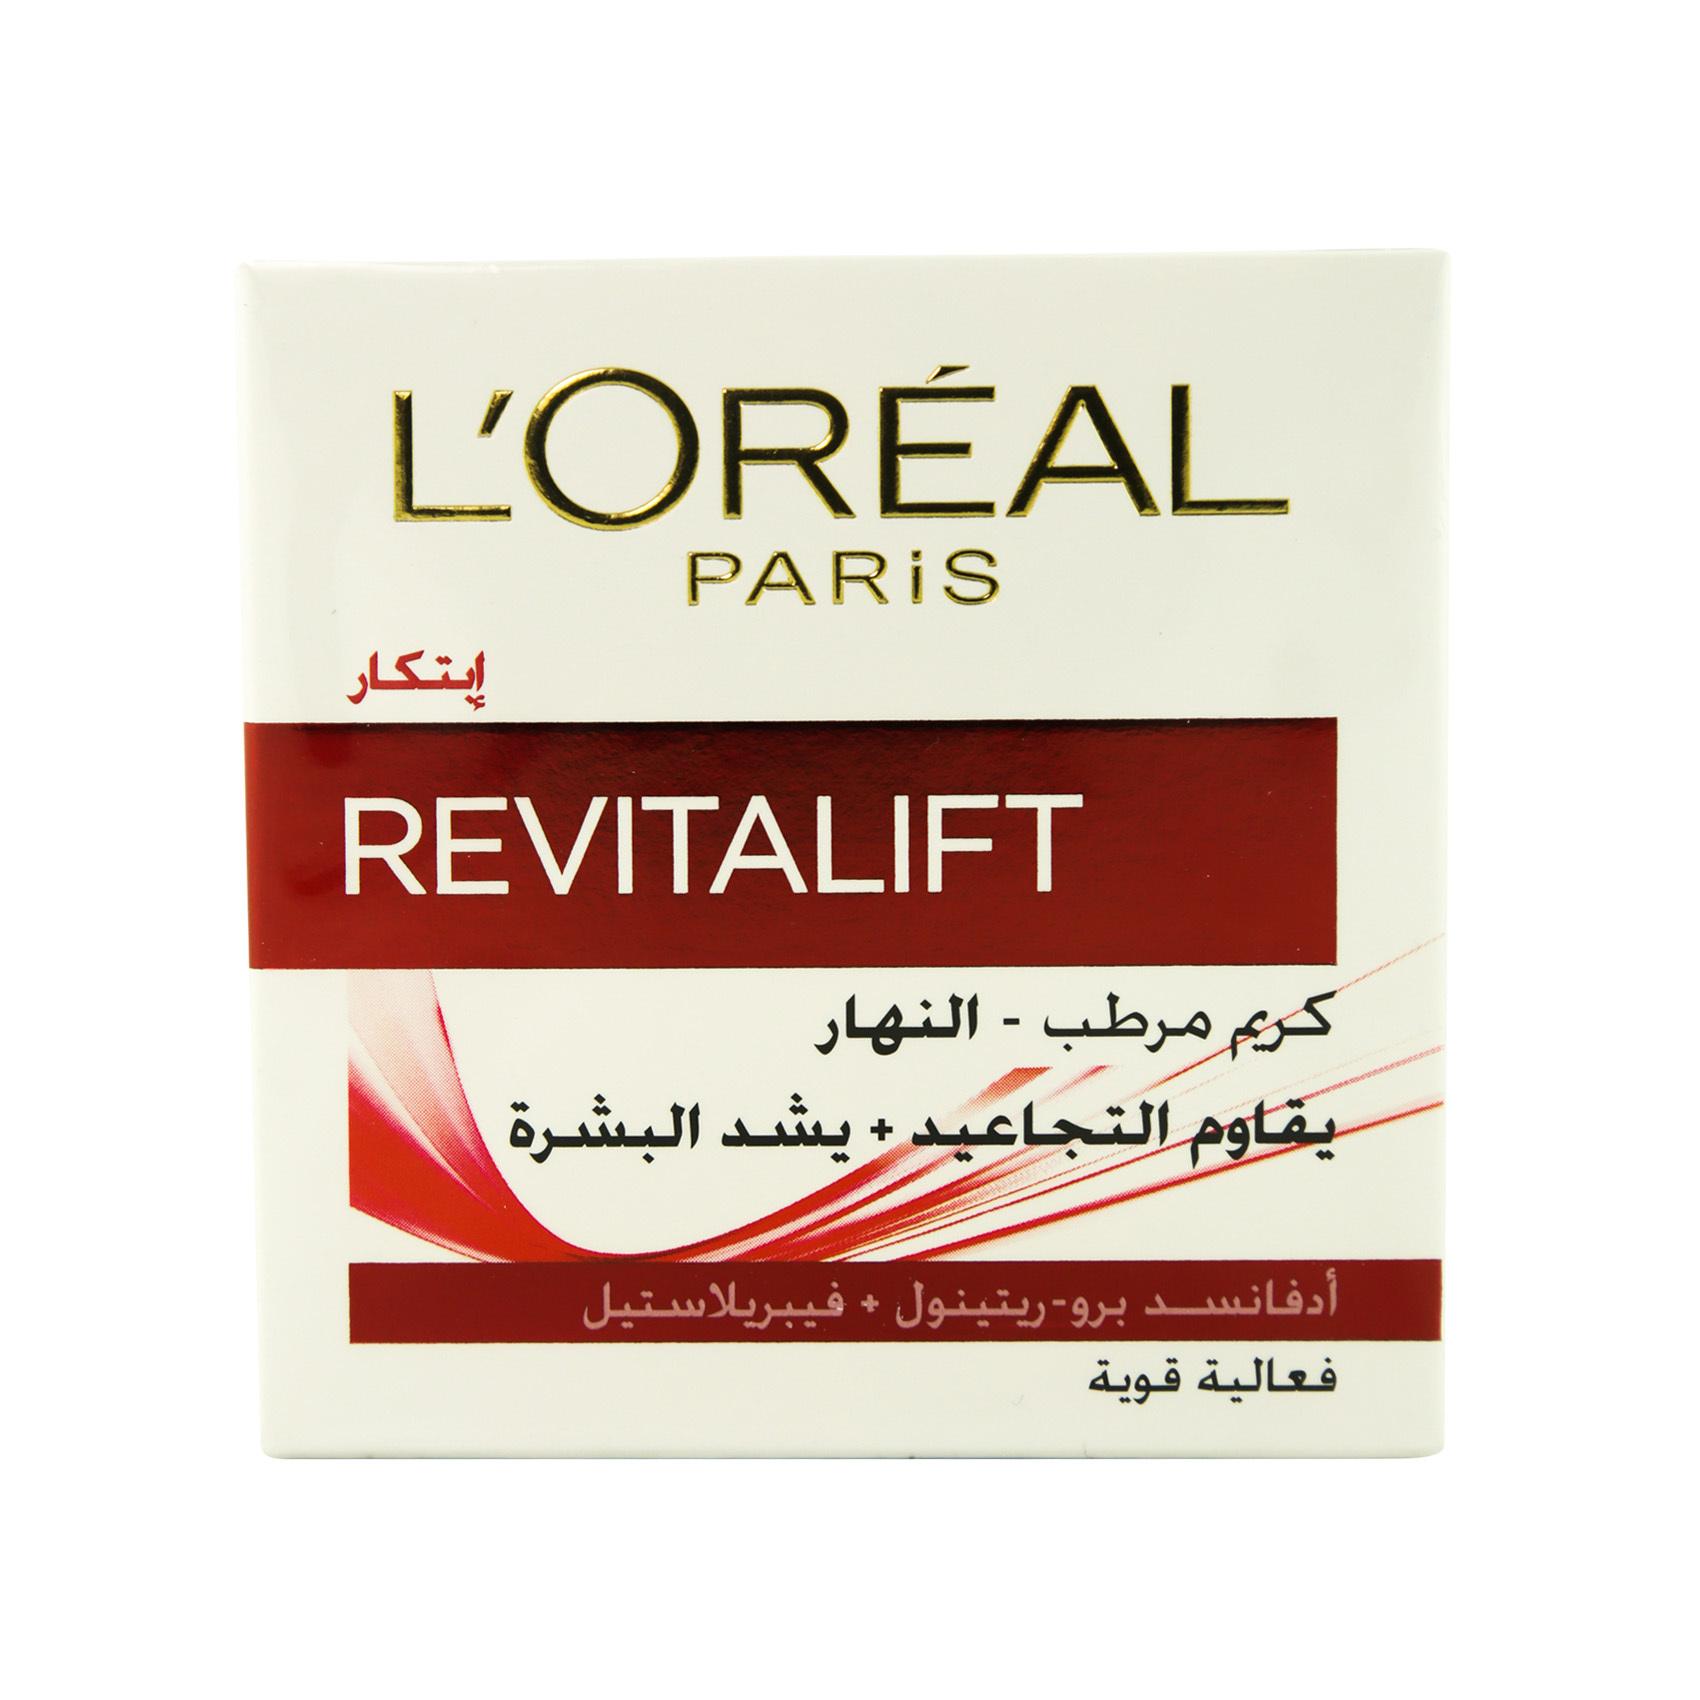 L'OREAL REVITALIFT DAYCREAM JAR50ML